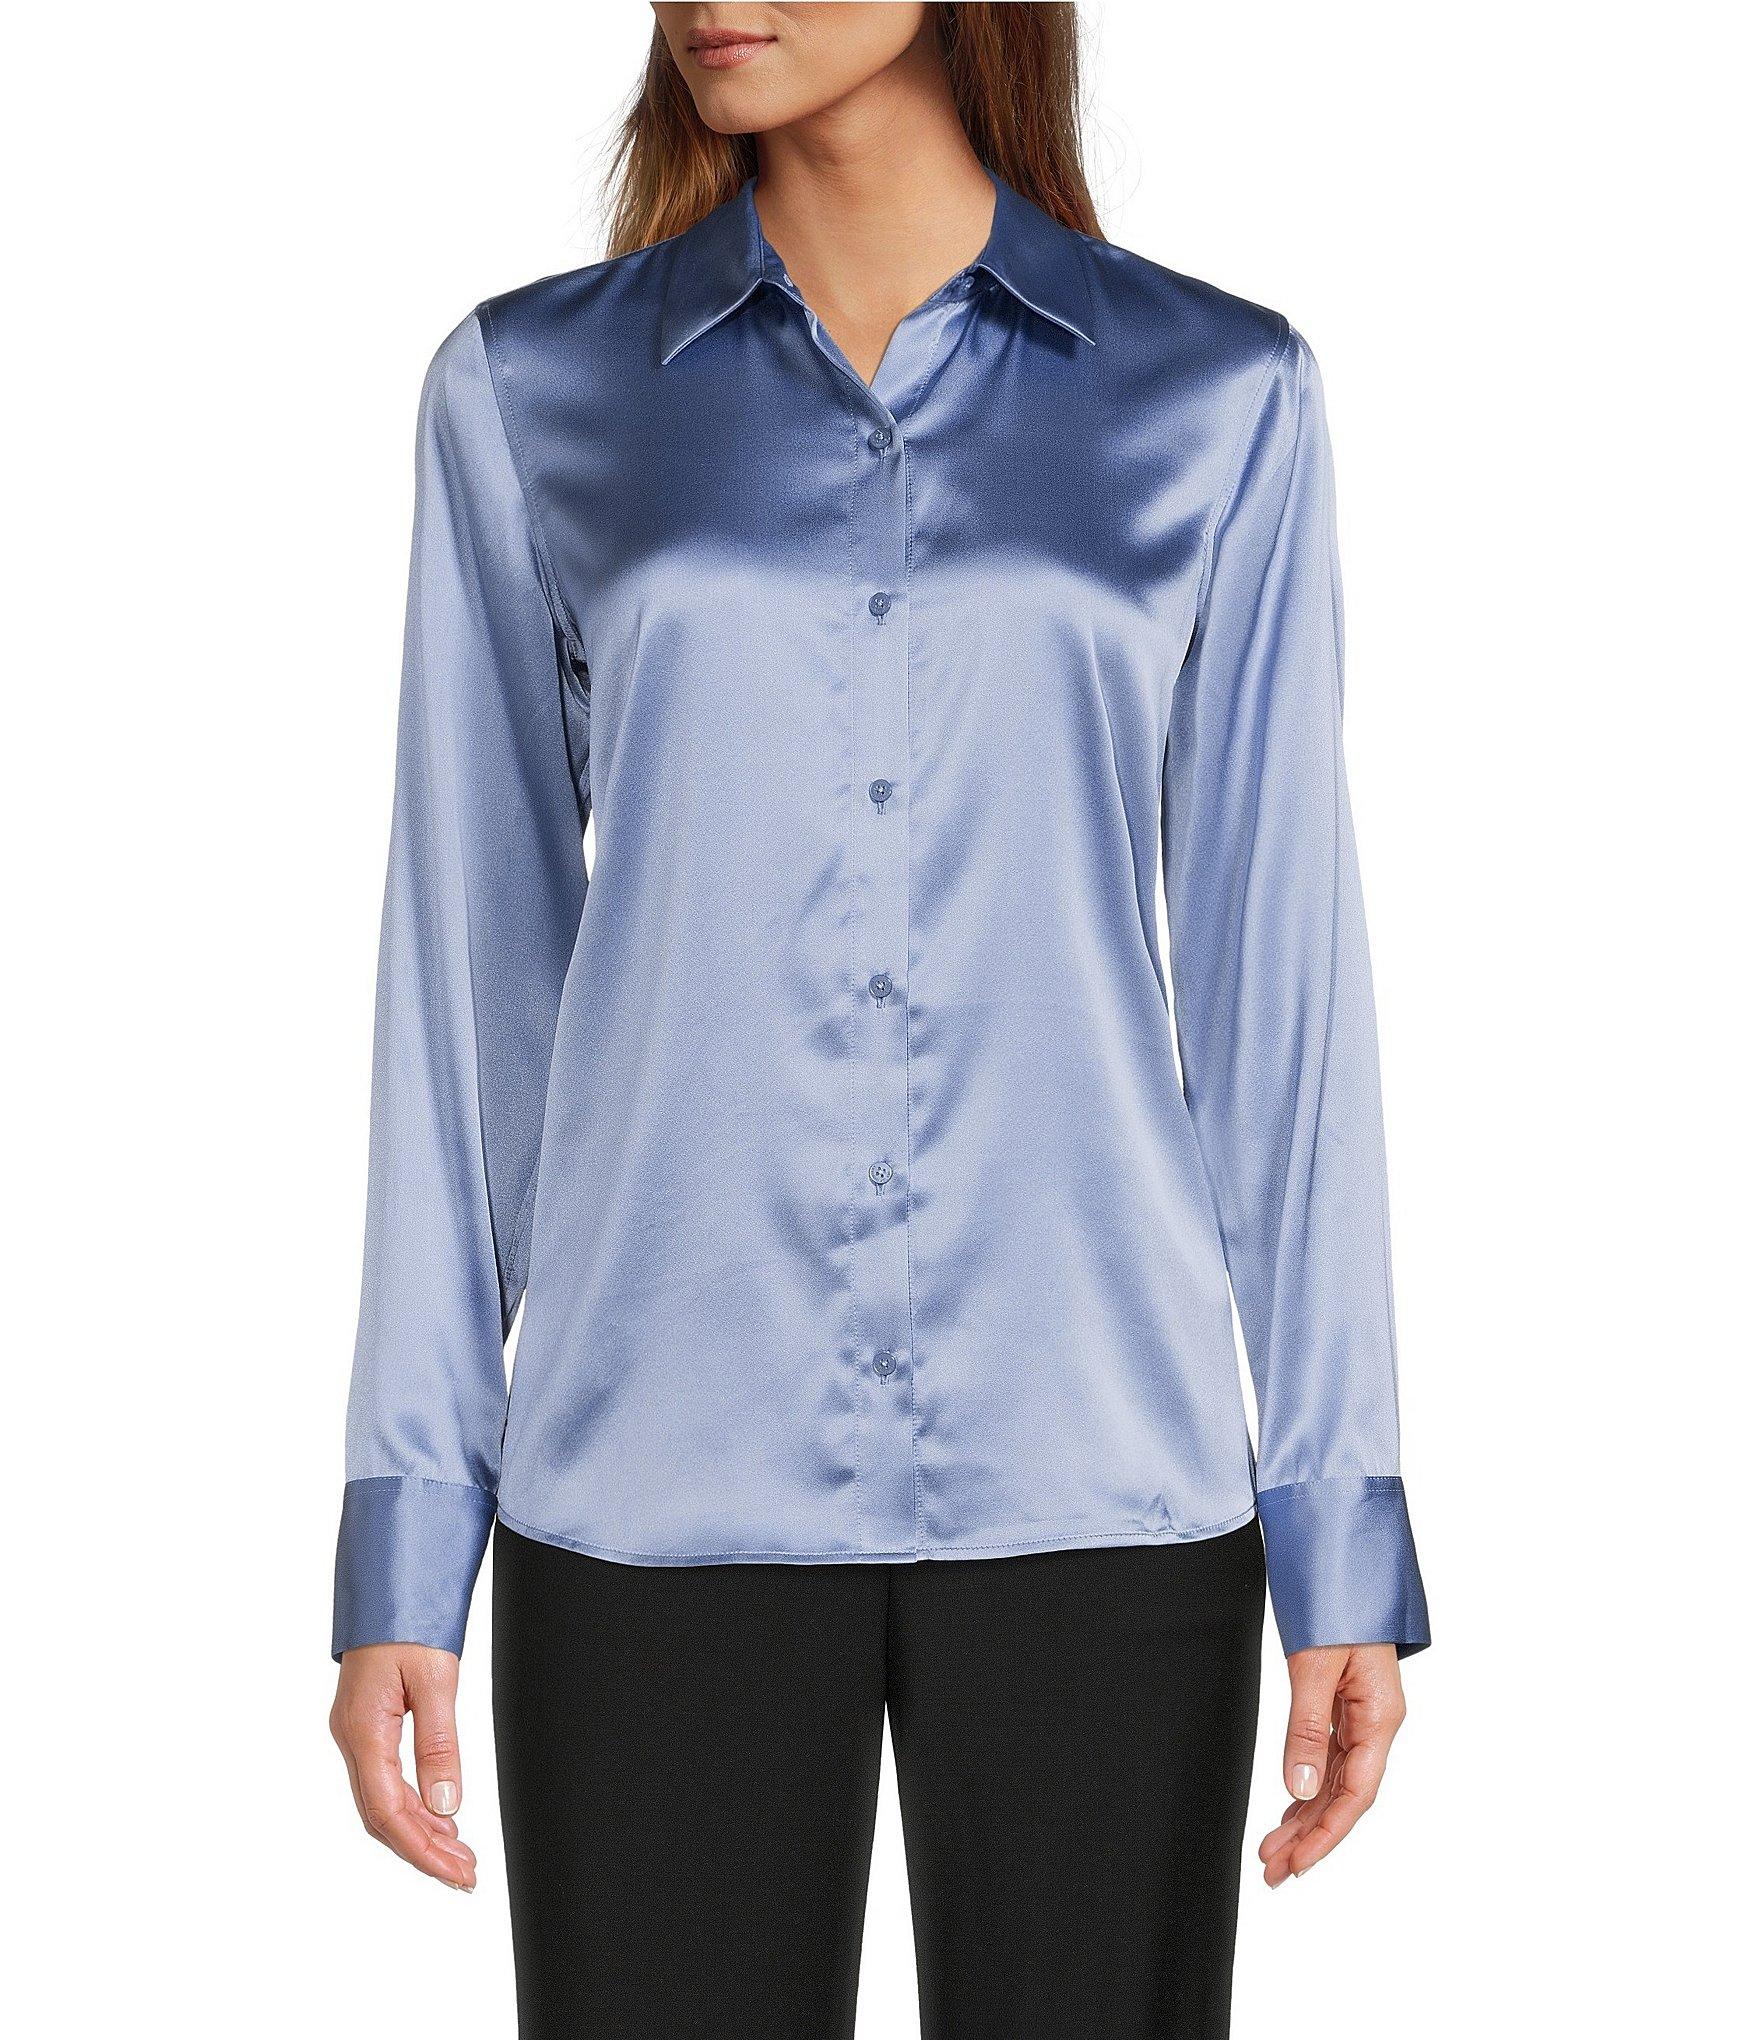 Button-Front Shirt Women's Casual & Dressy Tops & Blouses | Dillard's